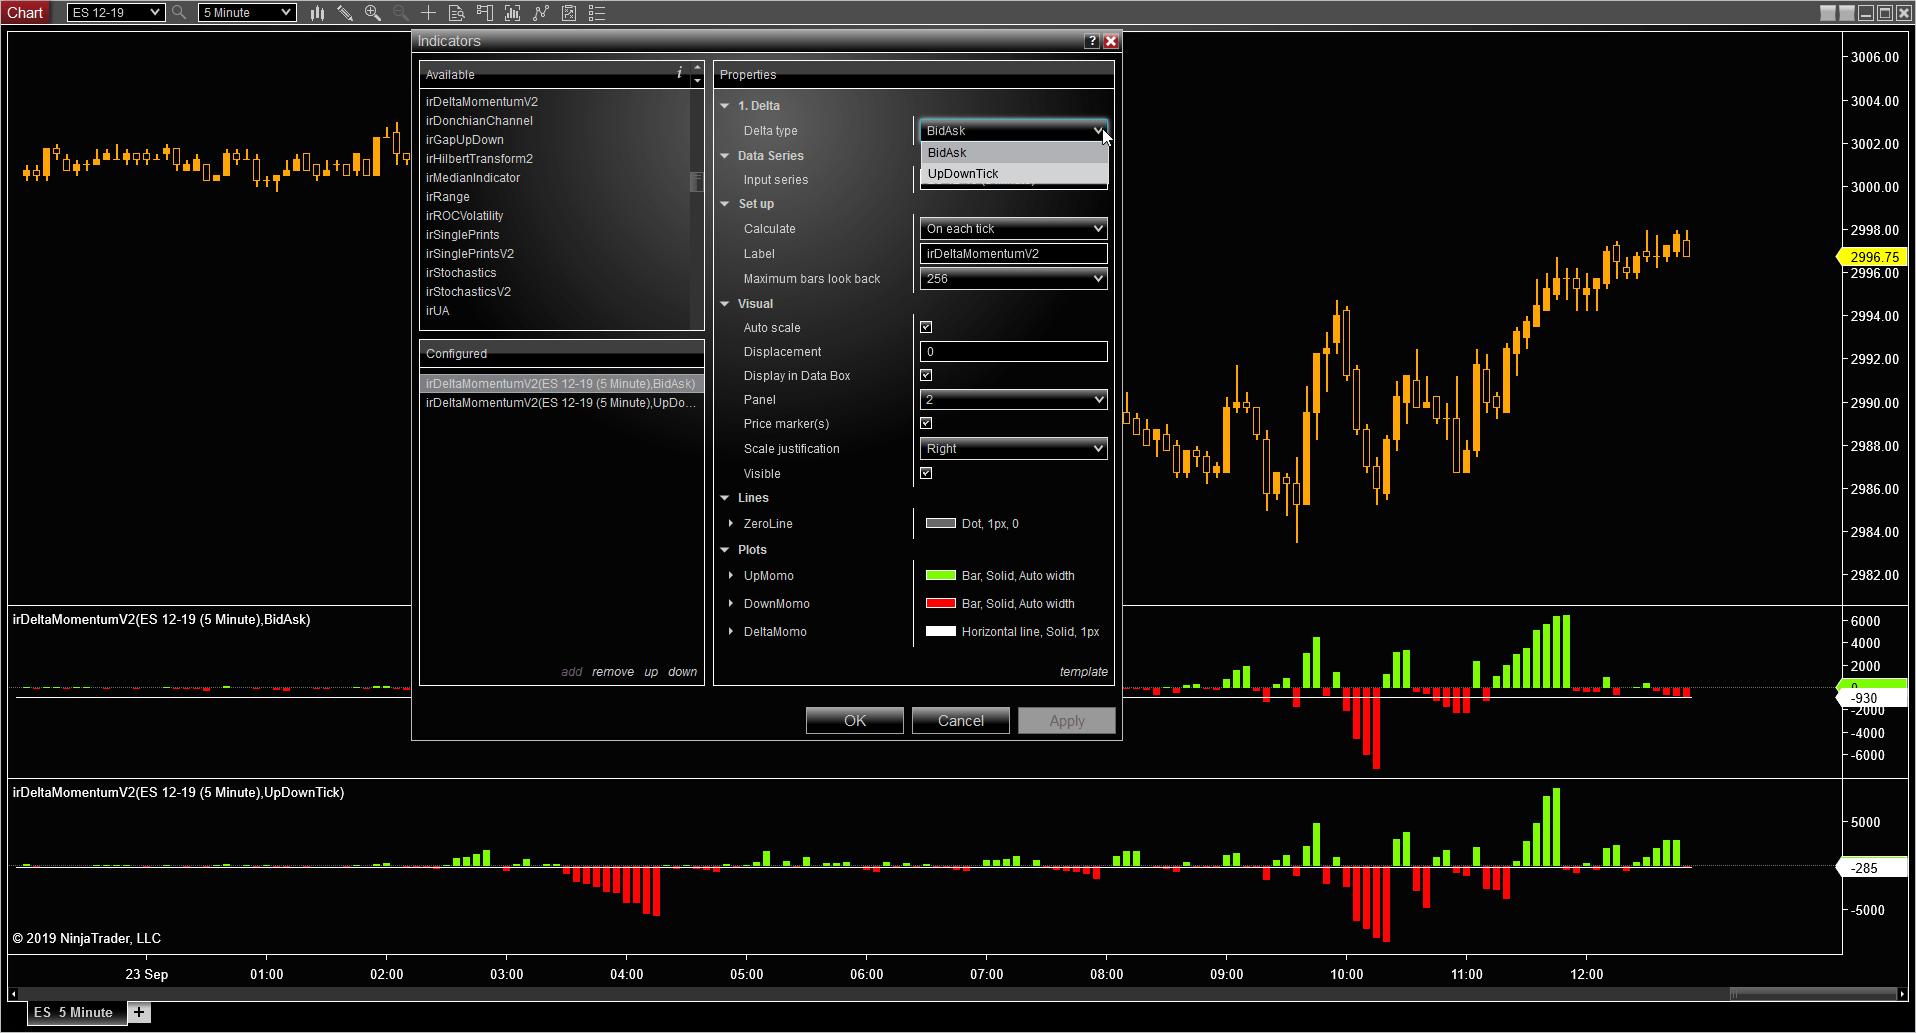 irDeltaMomentumV2 indicator